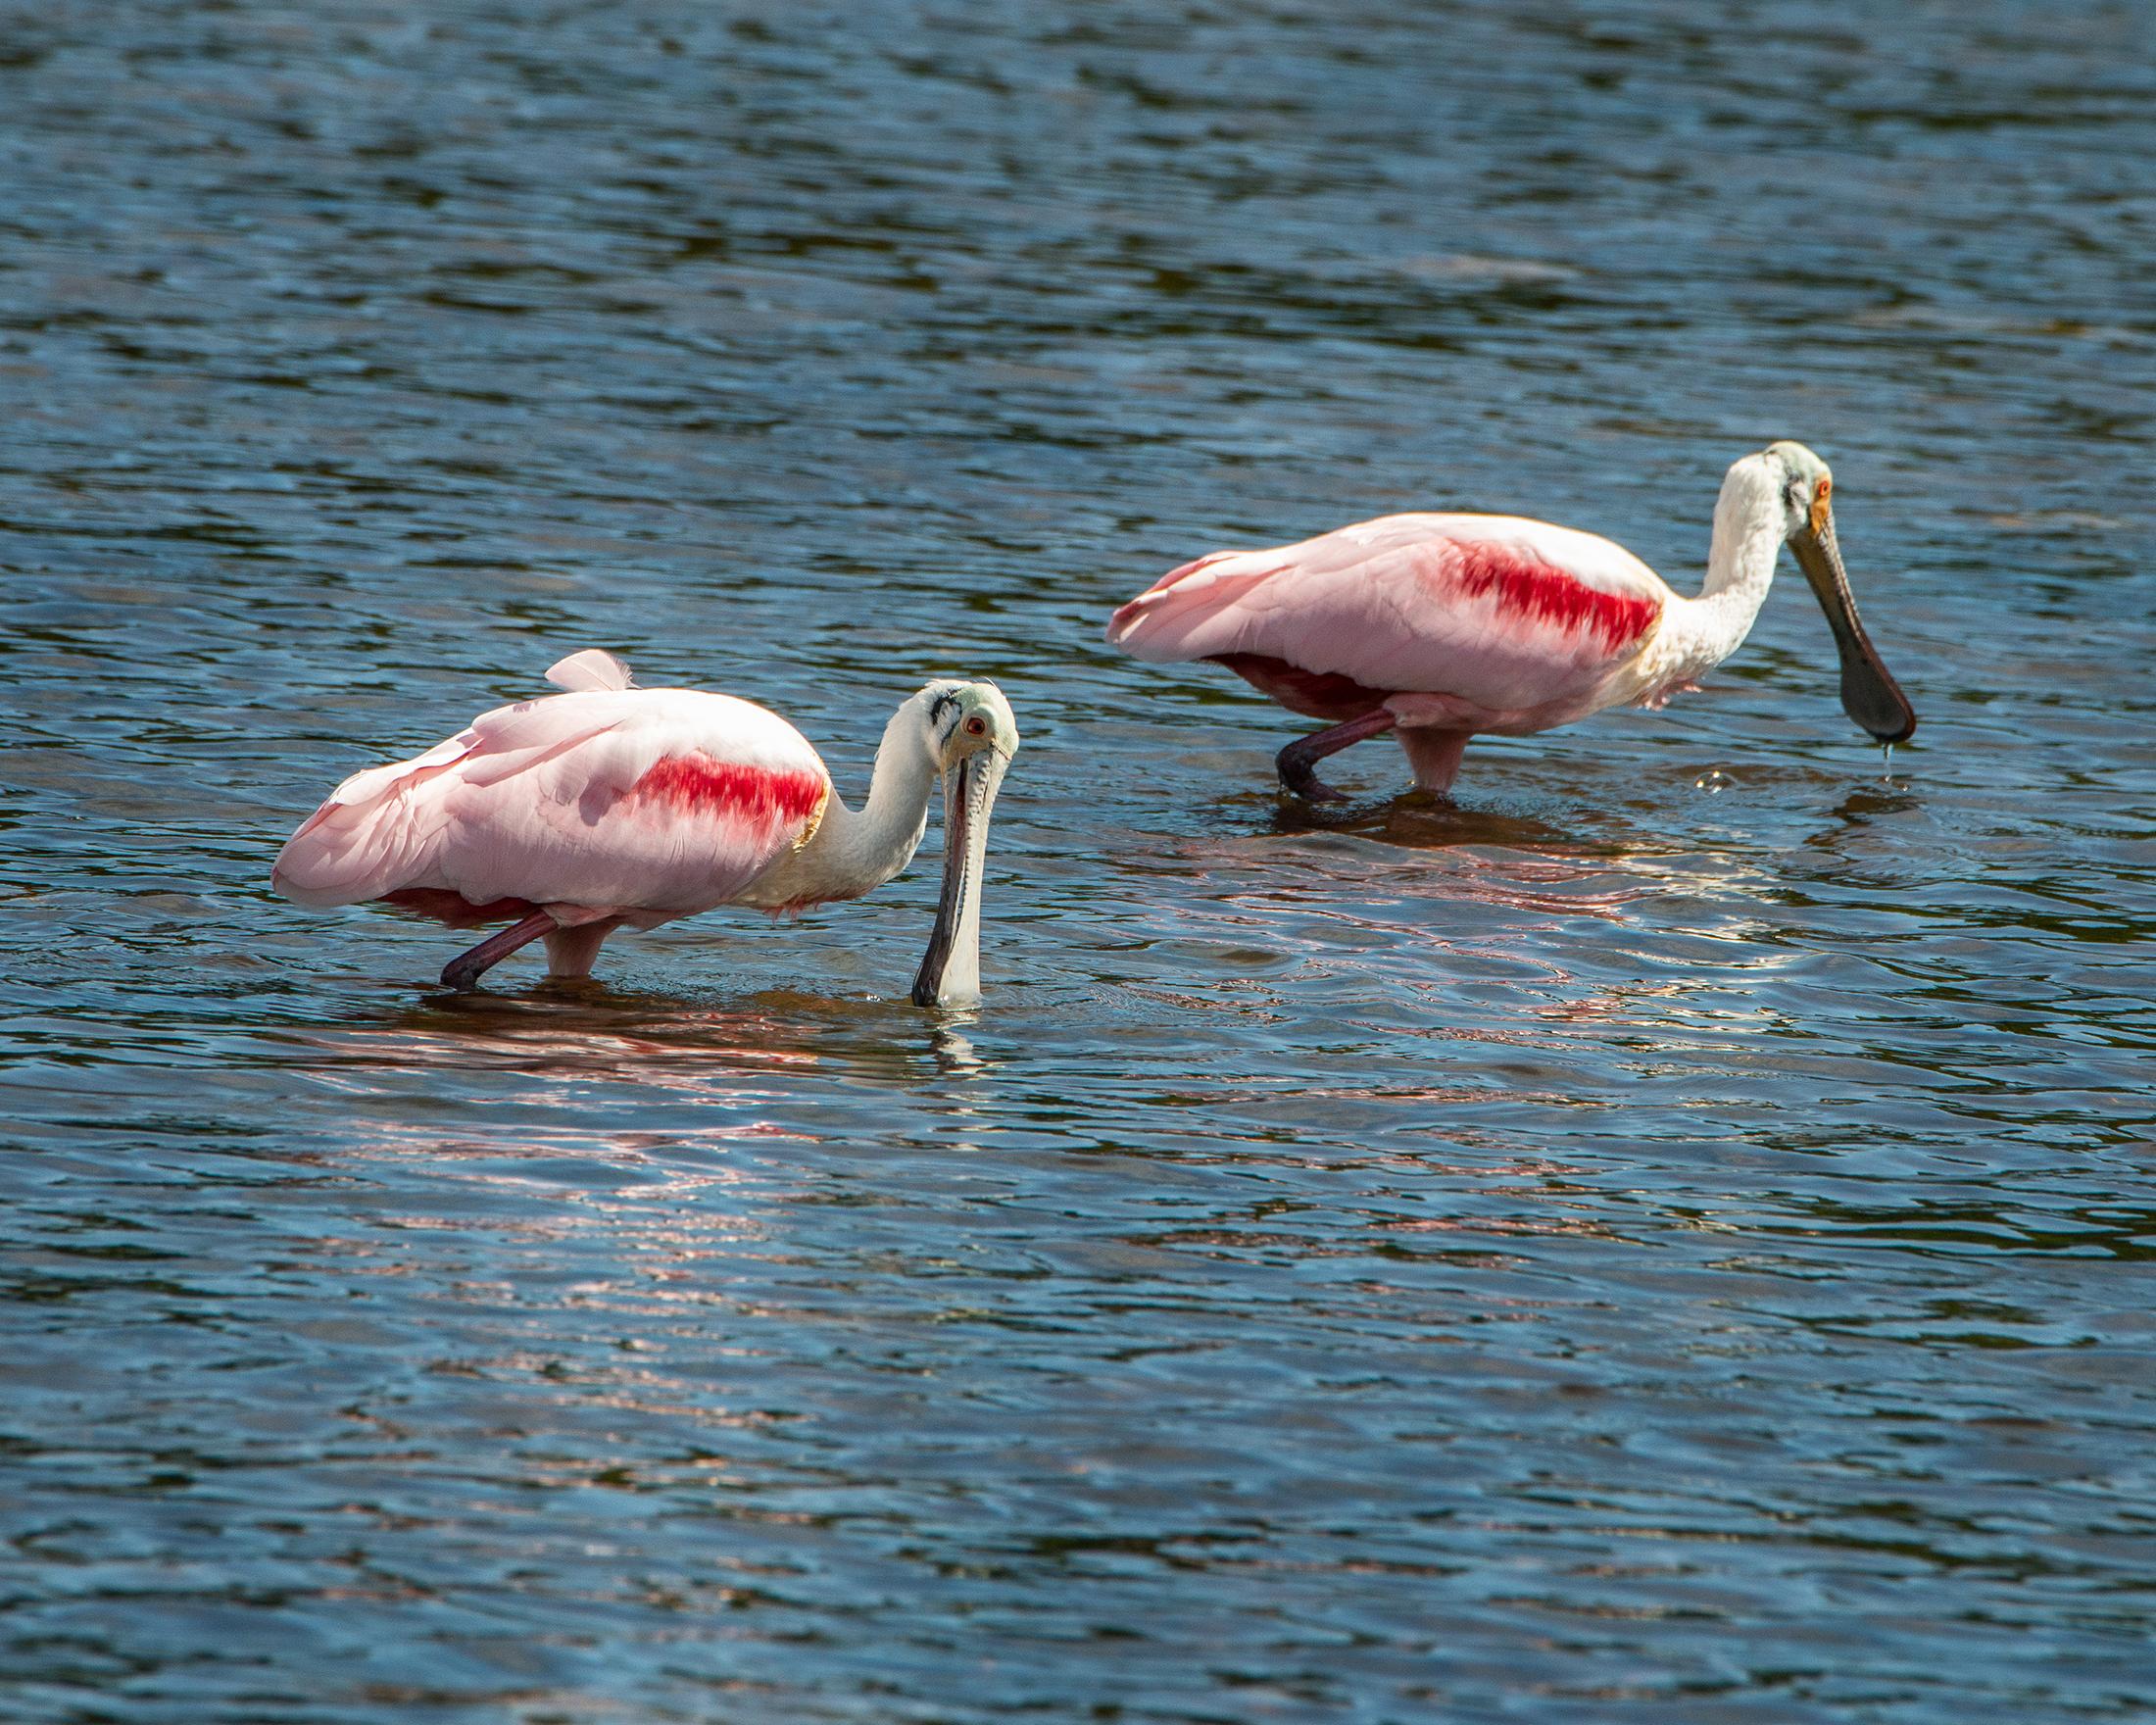 #roseate, #roseatespoonbill, #dingdarling, #sanibel, #birds, #birdphotography, #wadingbirds, #wildlife, #lowtide, #nikon